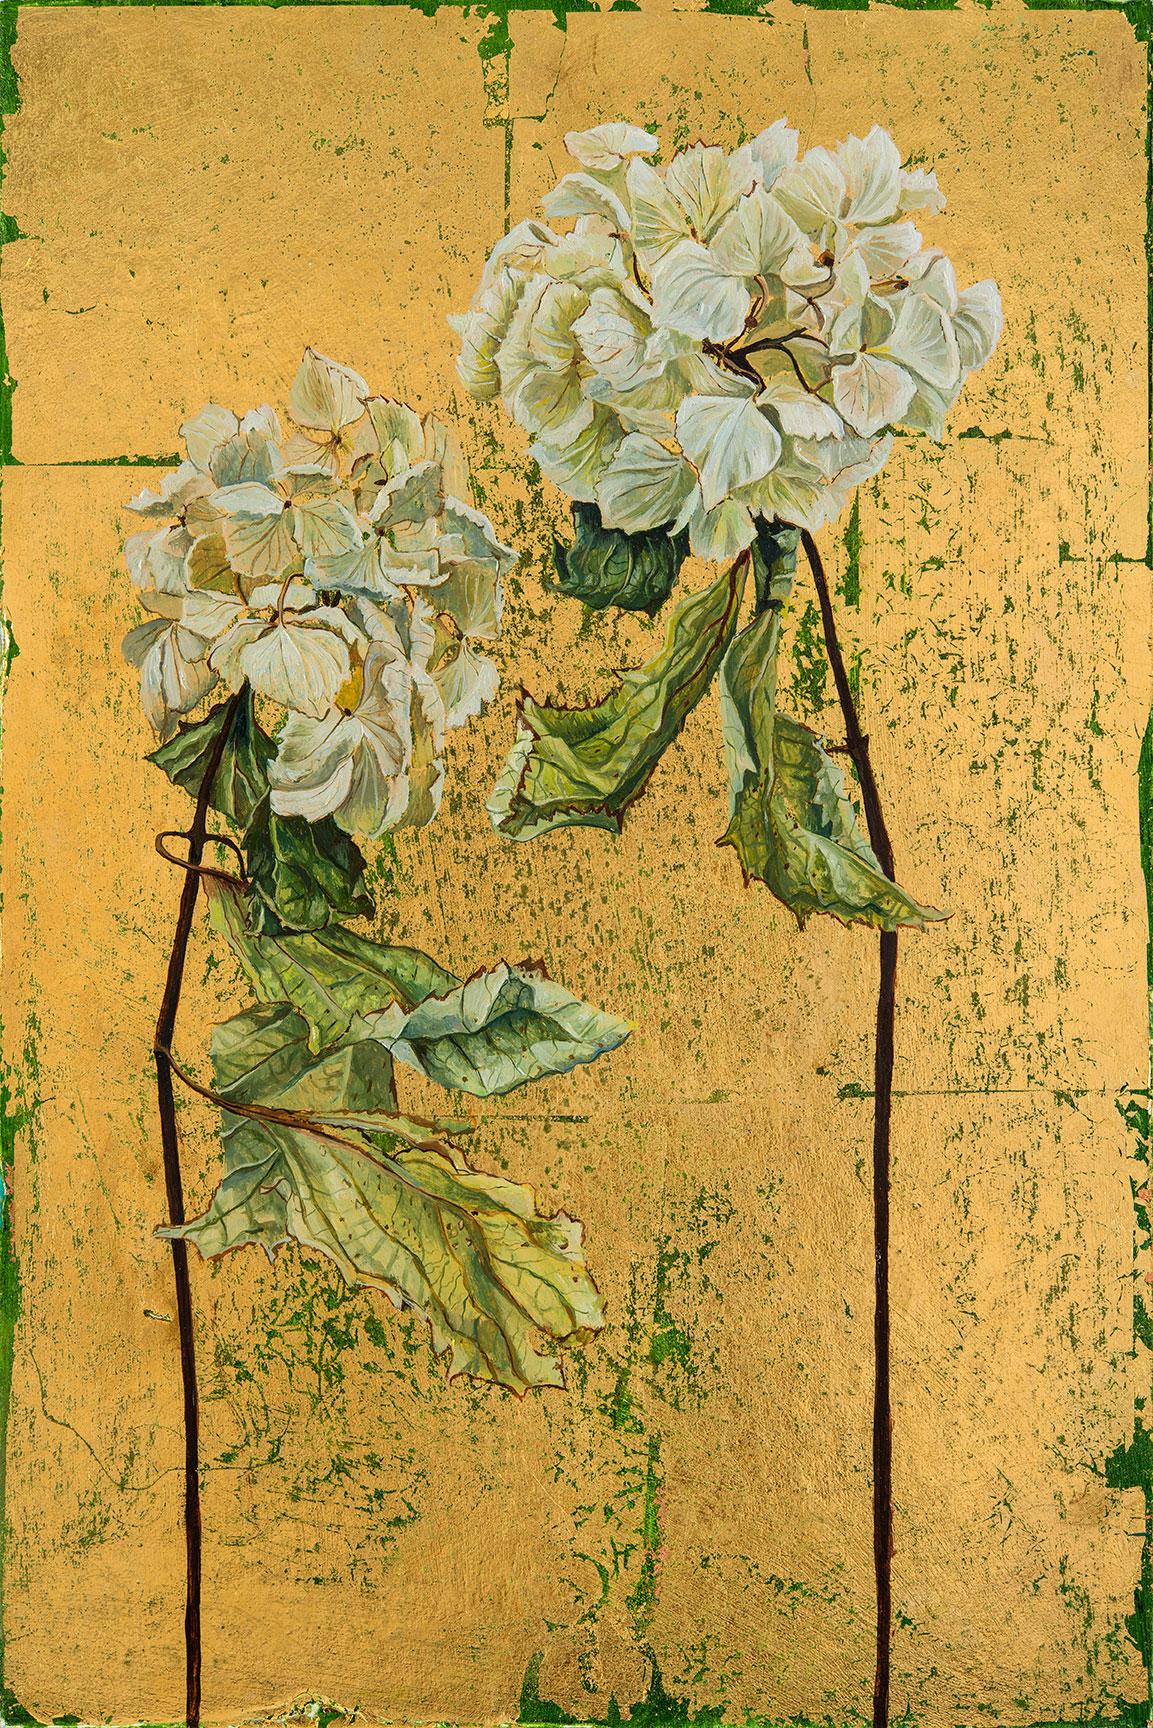 'White Hydrangeas', Oil and Metal Leaf on Card, 37.5cm x 25cm , 2015. SOLD